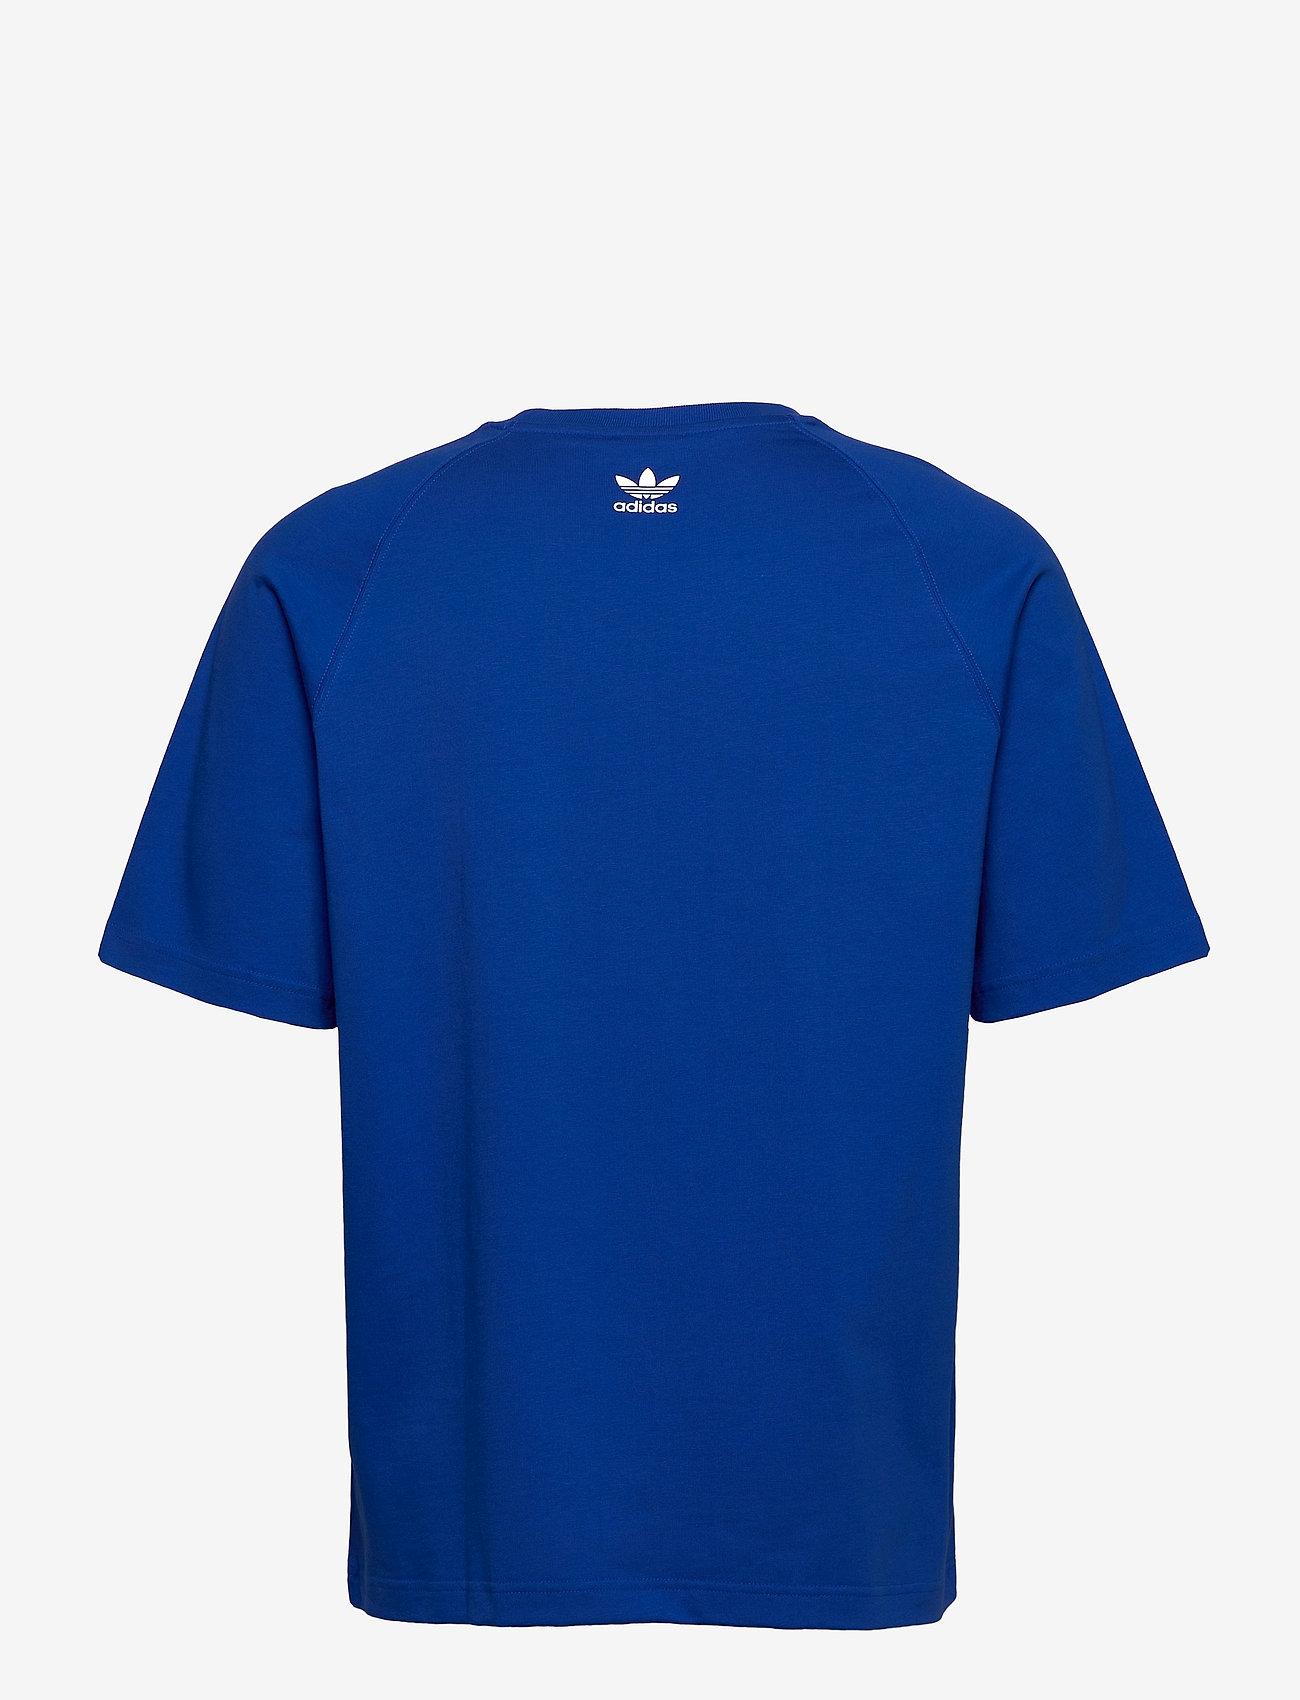 adidas Originals BG TRF OUT TEE - T-skjorter ROYBLU/WHITE - Menn Klær